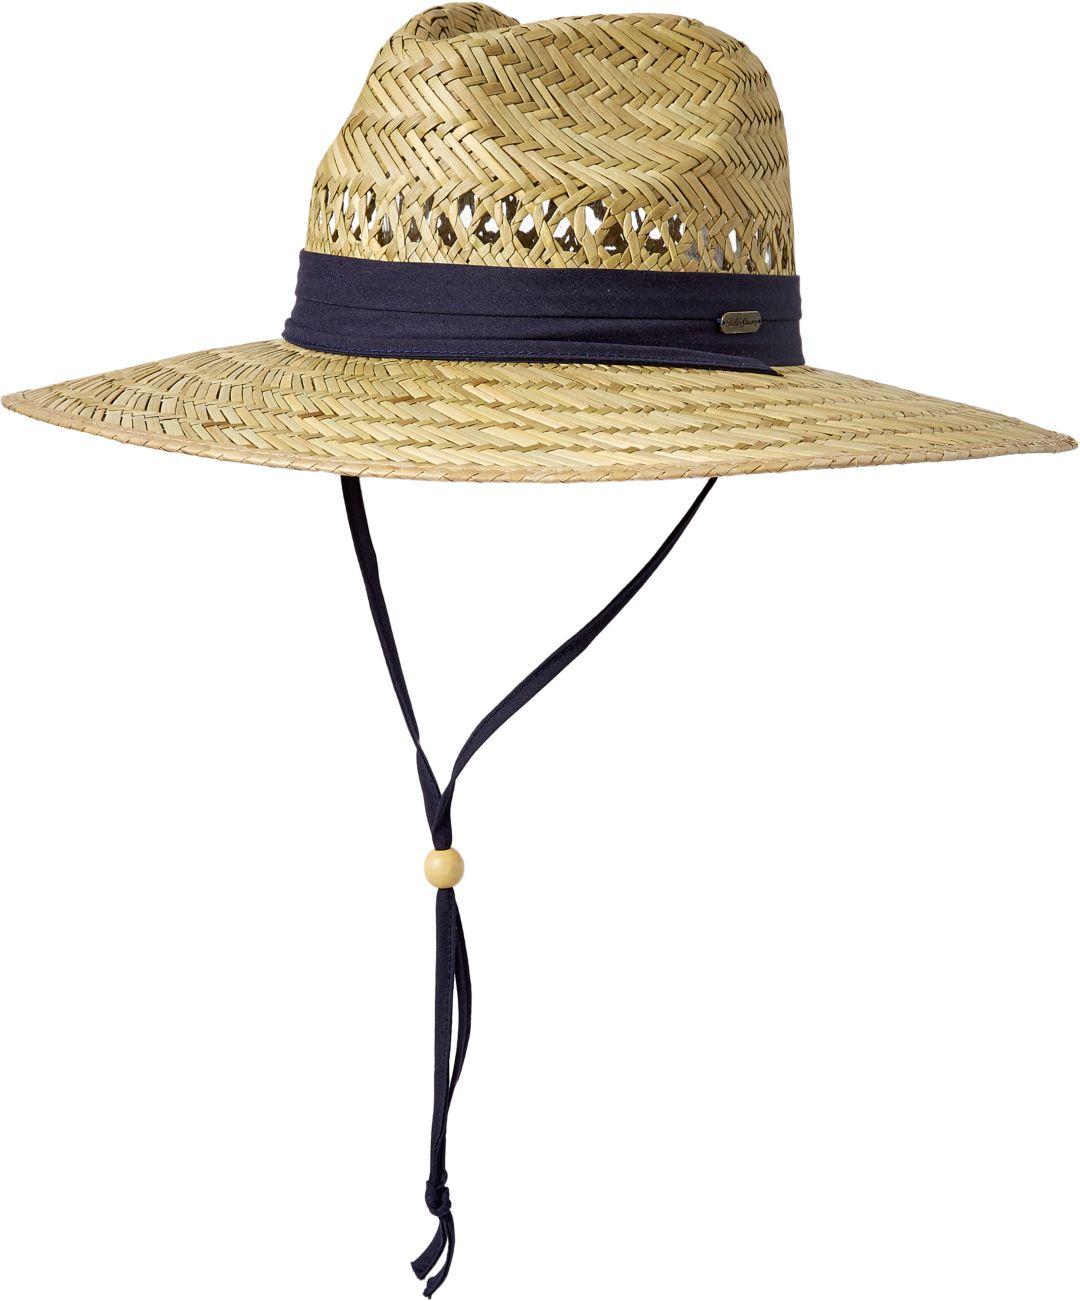 8551b4520b73db Field & Stream Men's Evershade Lifeguard Hat. noImageFound. Previous